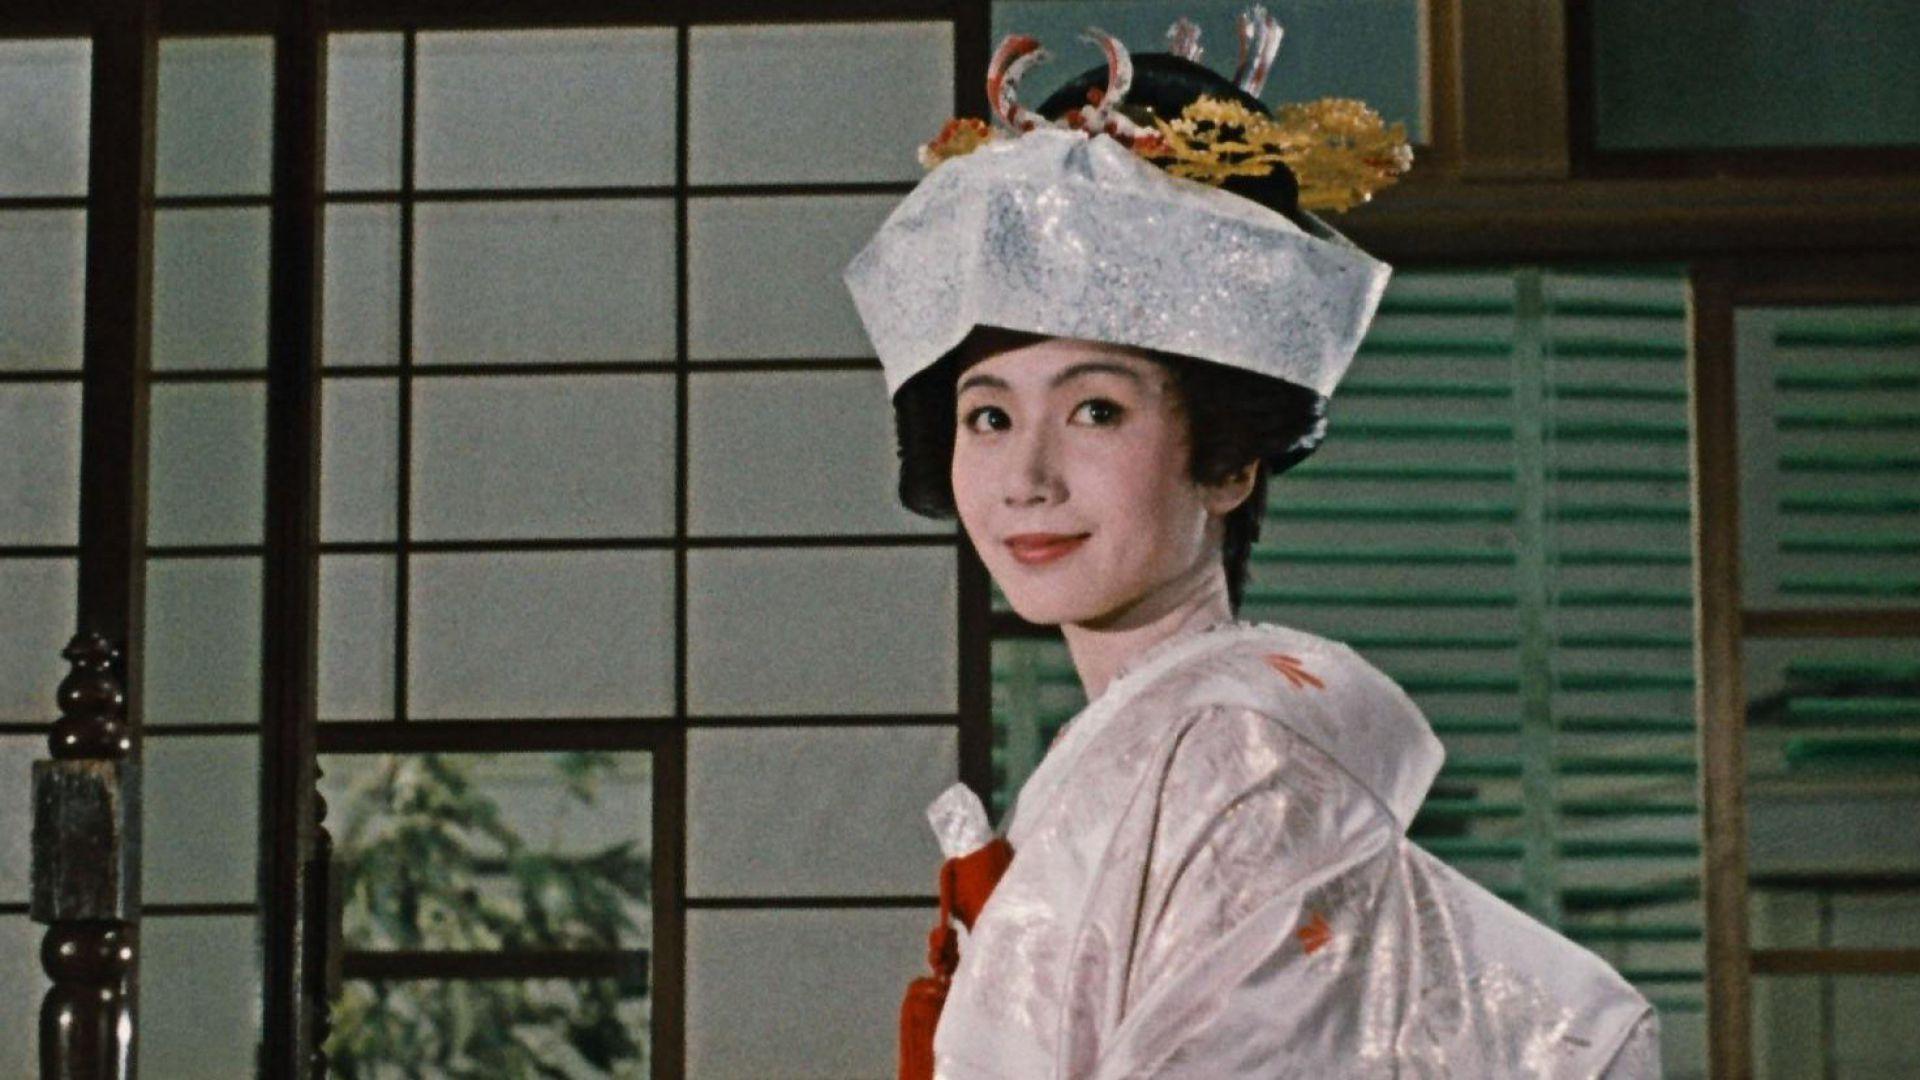 Shannon Richardson,Robin Riker Adult photos Mayuri Kango,Nozomi Takeuchi (b. 1980)